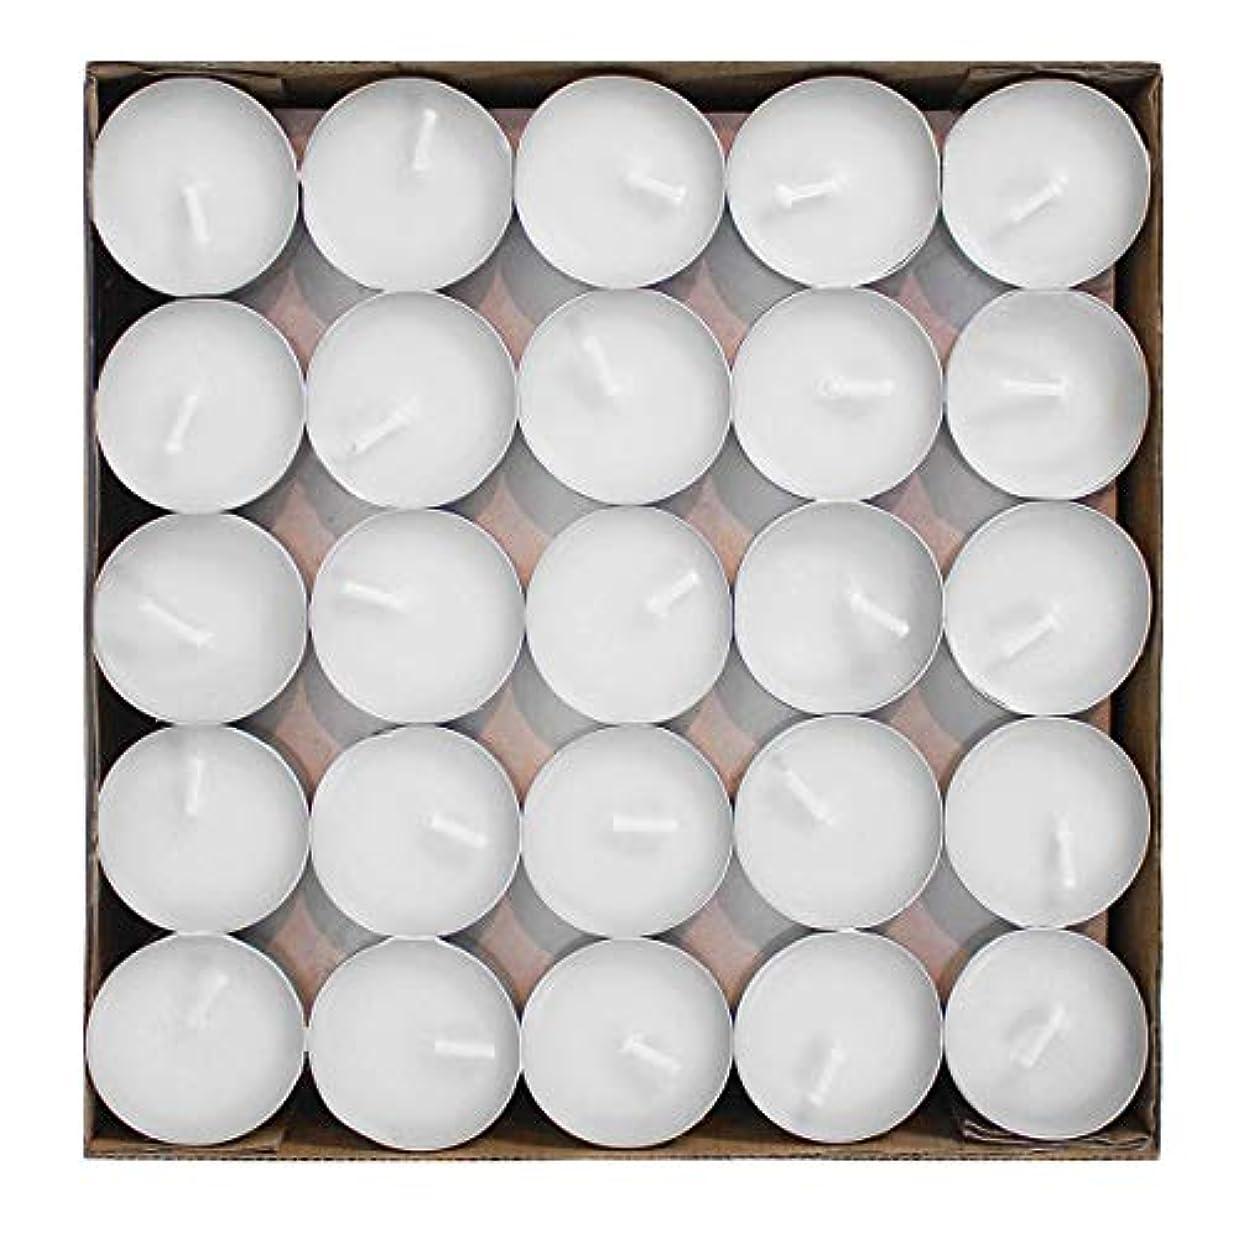 Hwagui ろうそく お茶アロマ キャンドル アロマ キャンドル ロウソク 人気 香り 約1.5-2時間 50個 ZH004